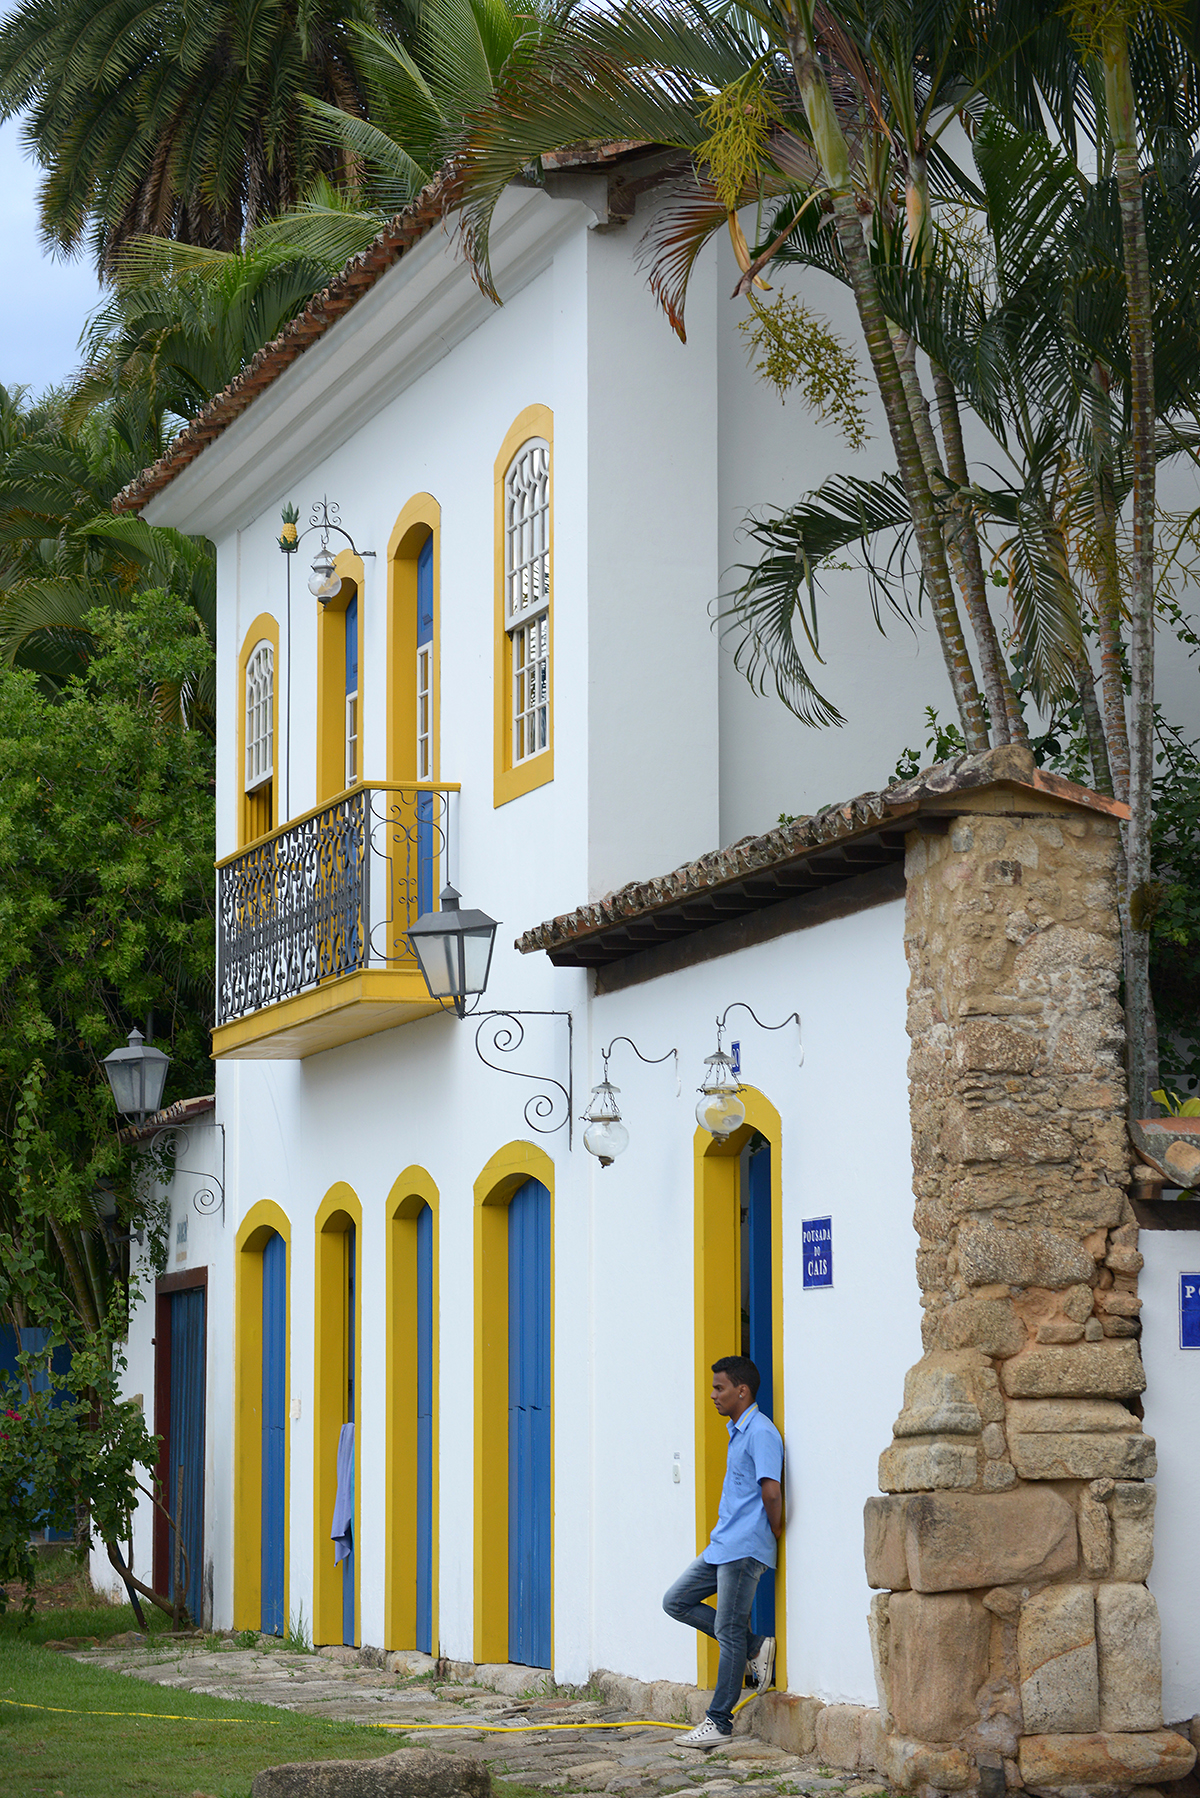 matkablogi, blogi, Brasilia, Paraty, värikäs, talo